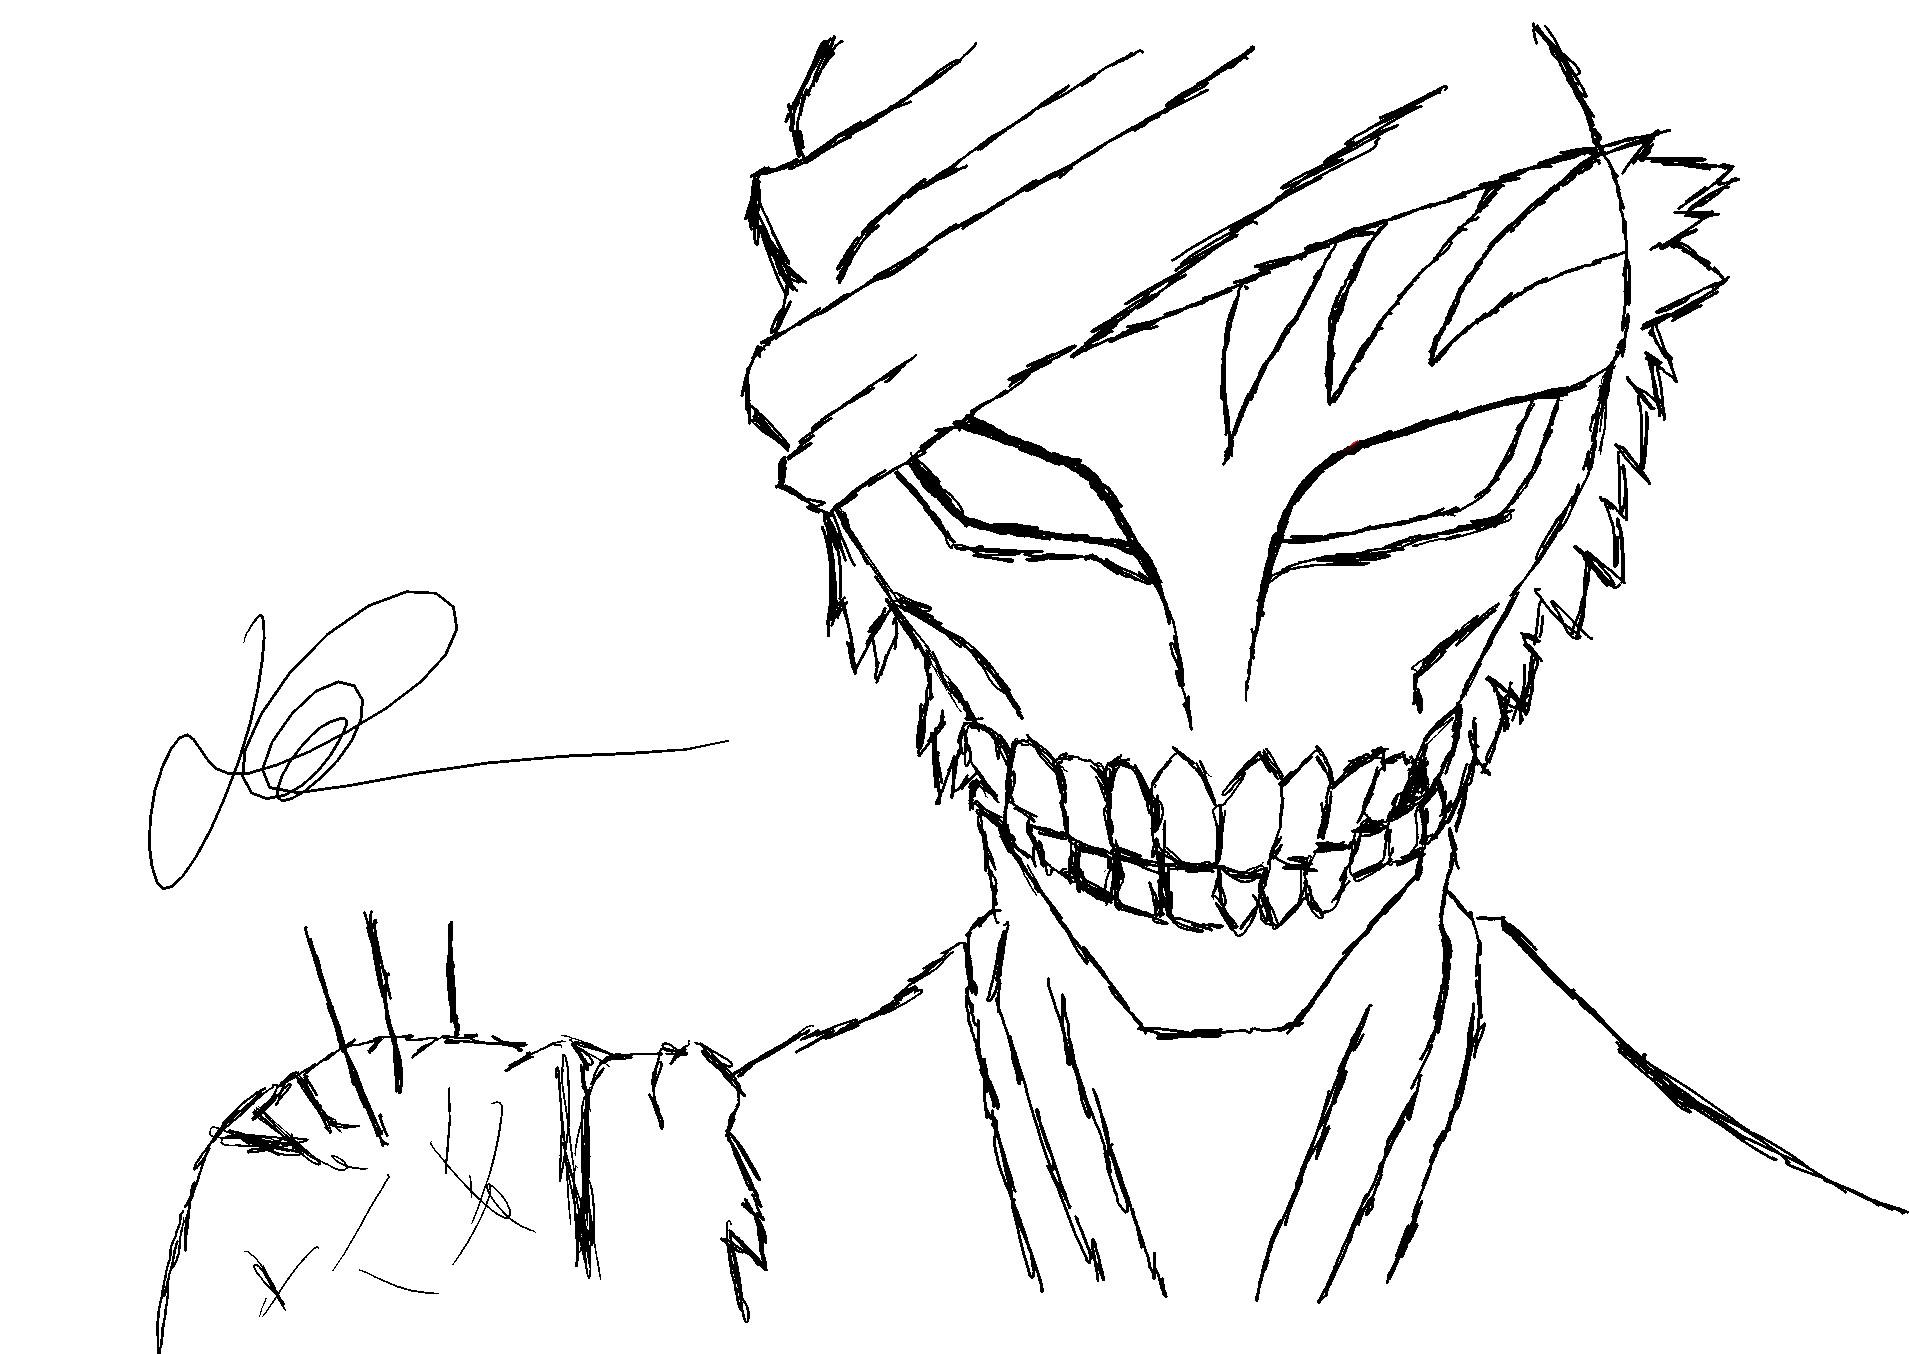 D Line Drawings Not Working : Hollow ichigo line work by kageryumusic on deviantart